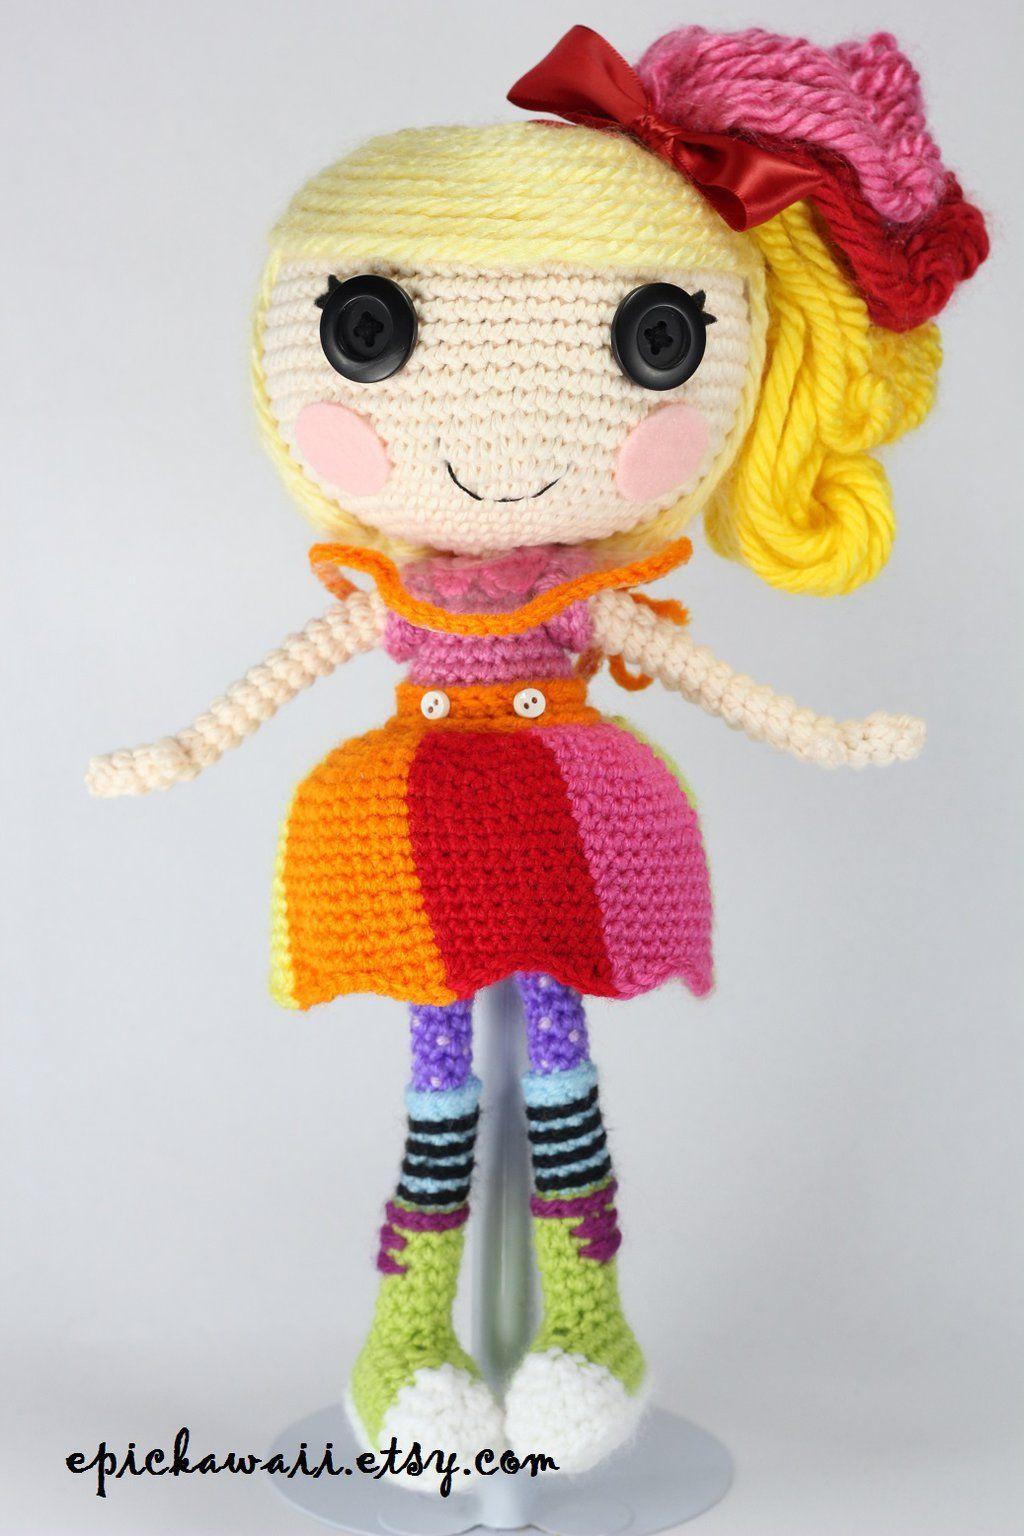 Amigurumi Crochet Lalaloopsy Doll Blue Model Free Pattern ... | 1536x1024